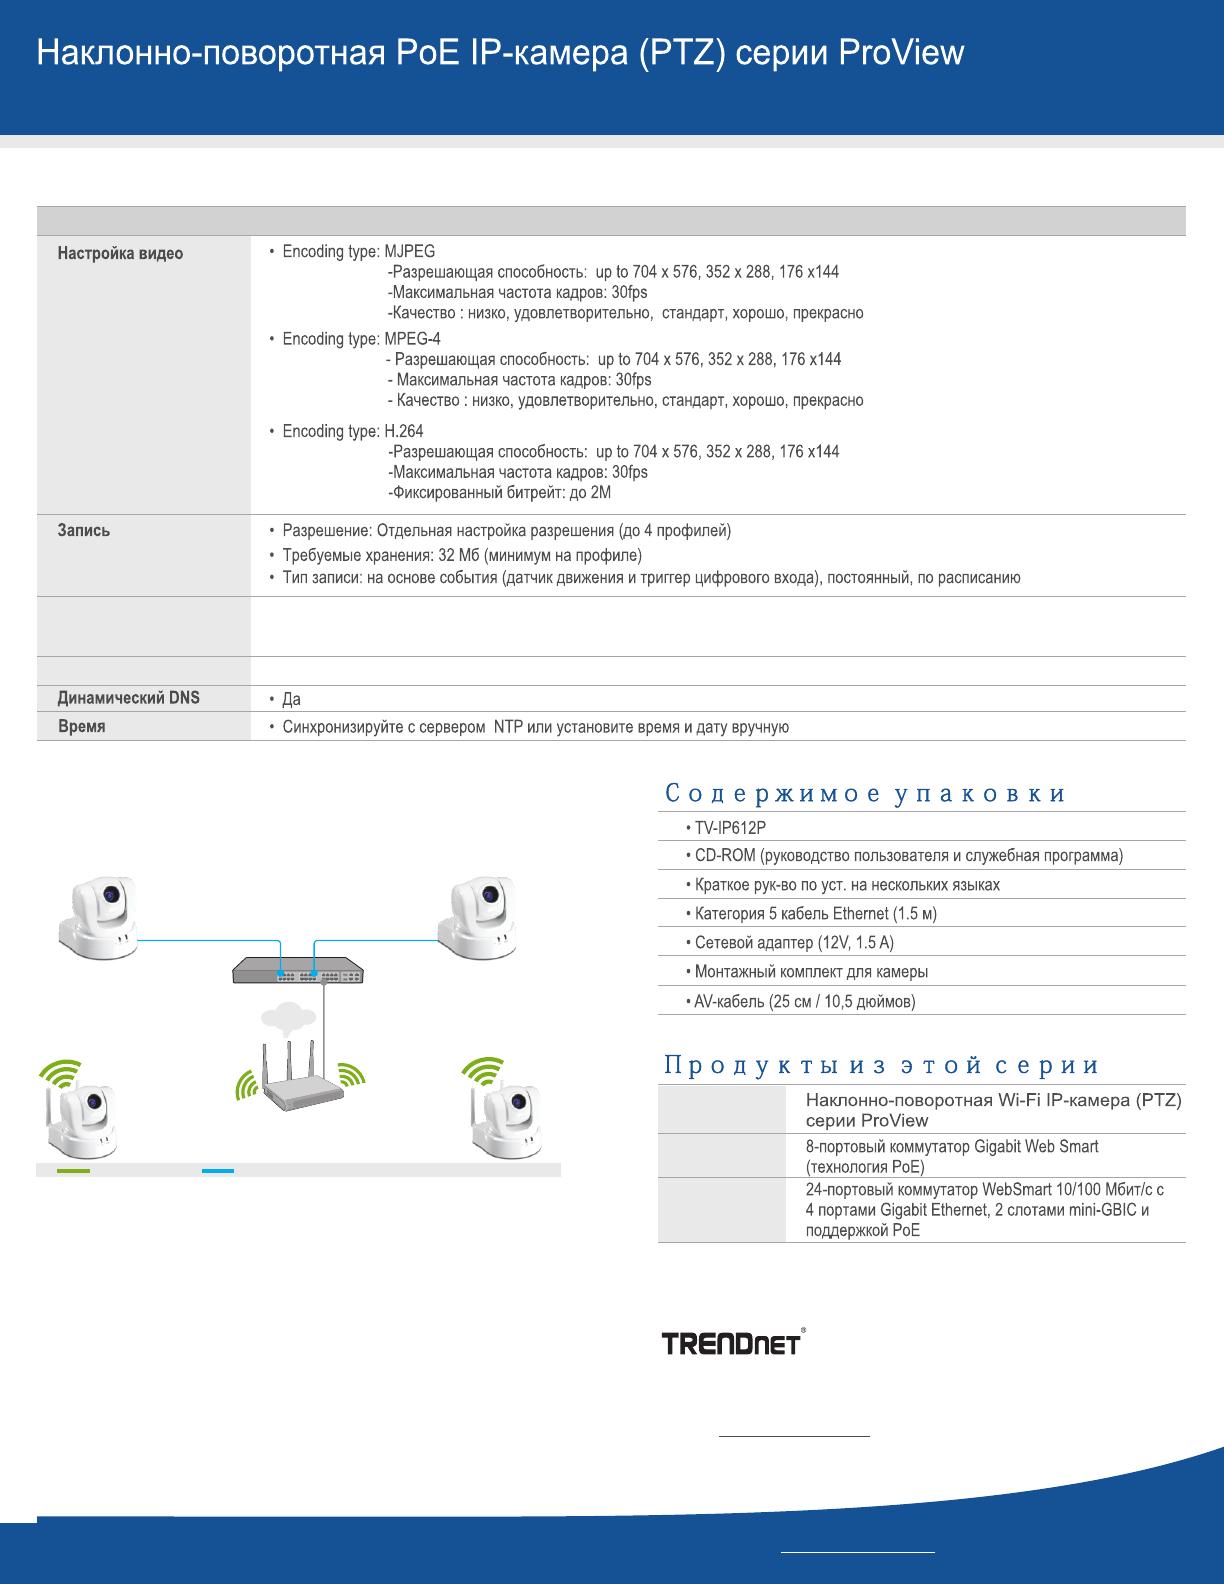 TRENDNET TV-IP612P V1.0R INTERNET CAMERA DRIVERS WINDOWS XP